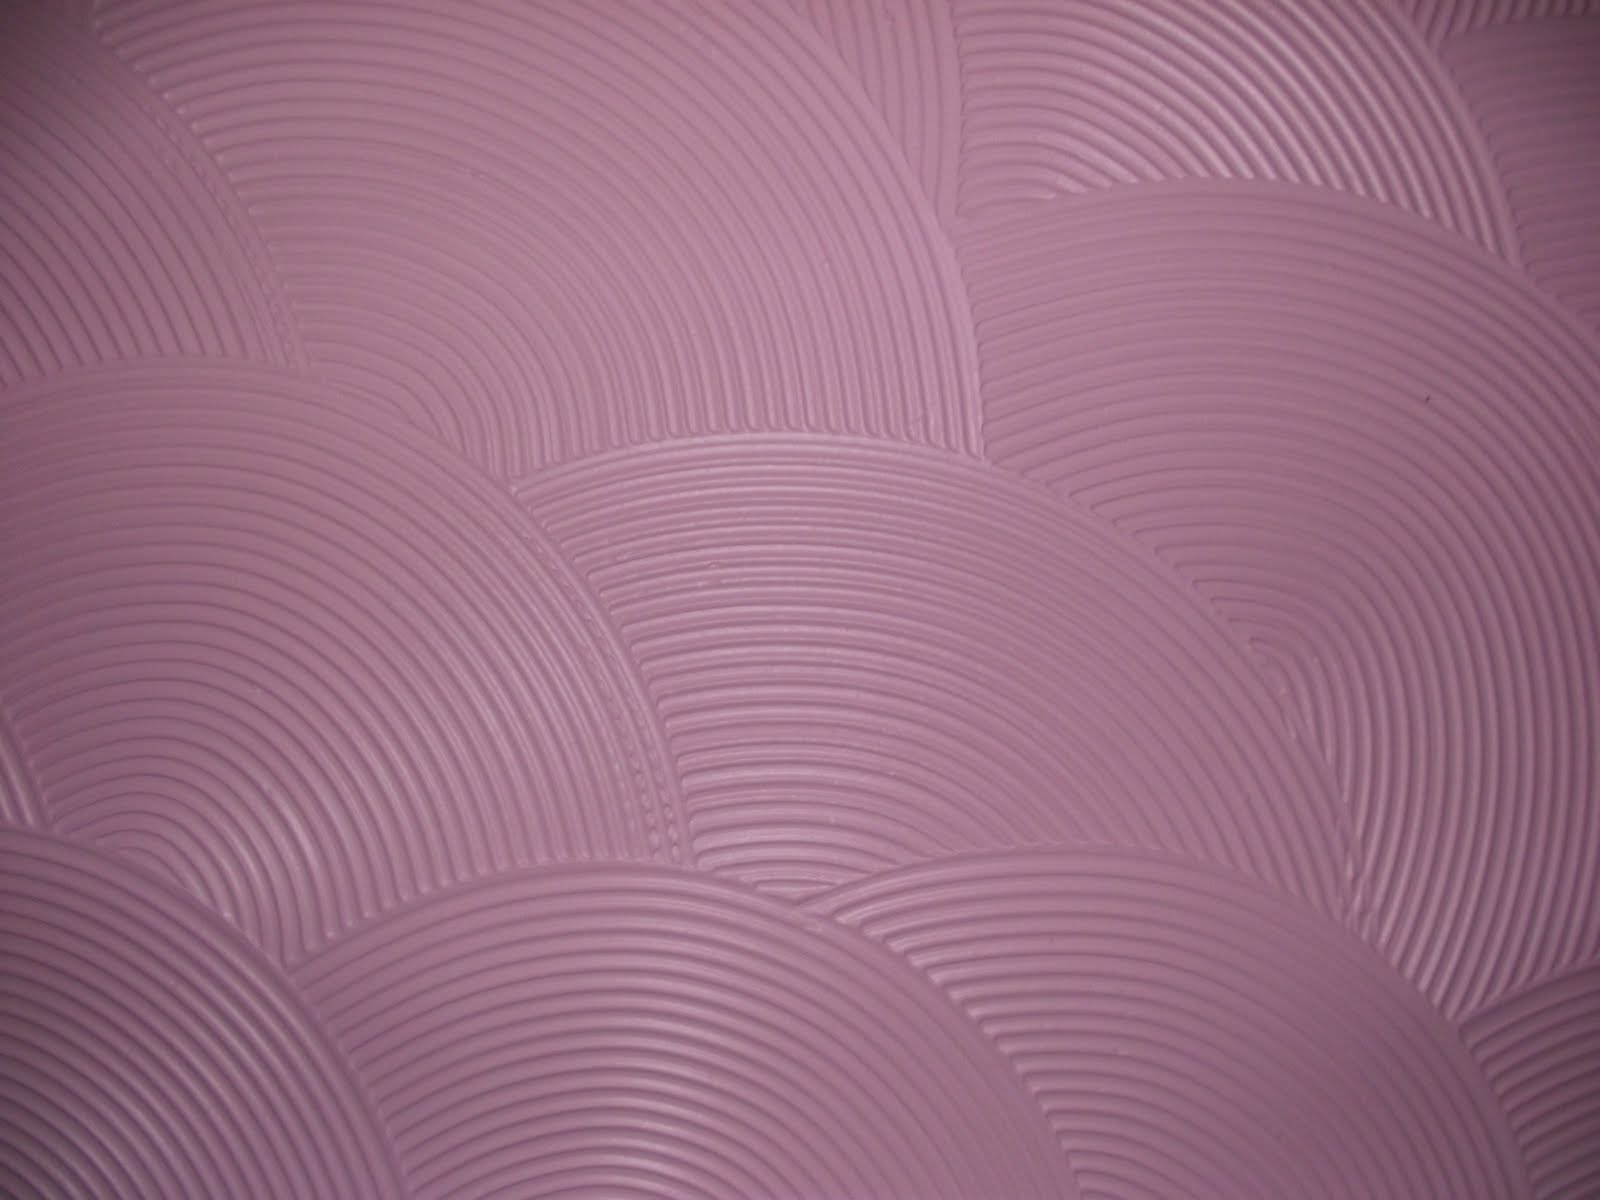 Arteirices da m texturas paredes velhas de cara nova - Tratamiento de humedades en paredes ...